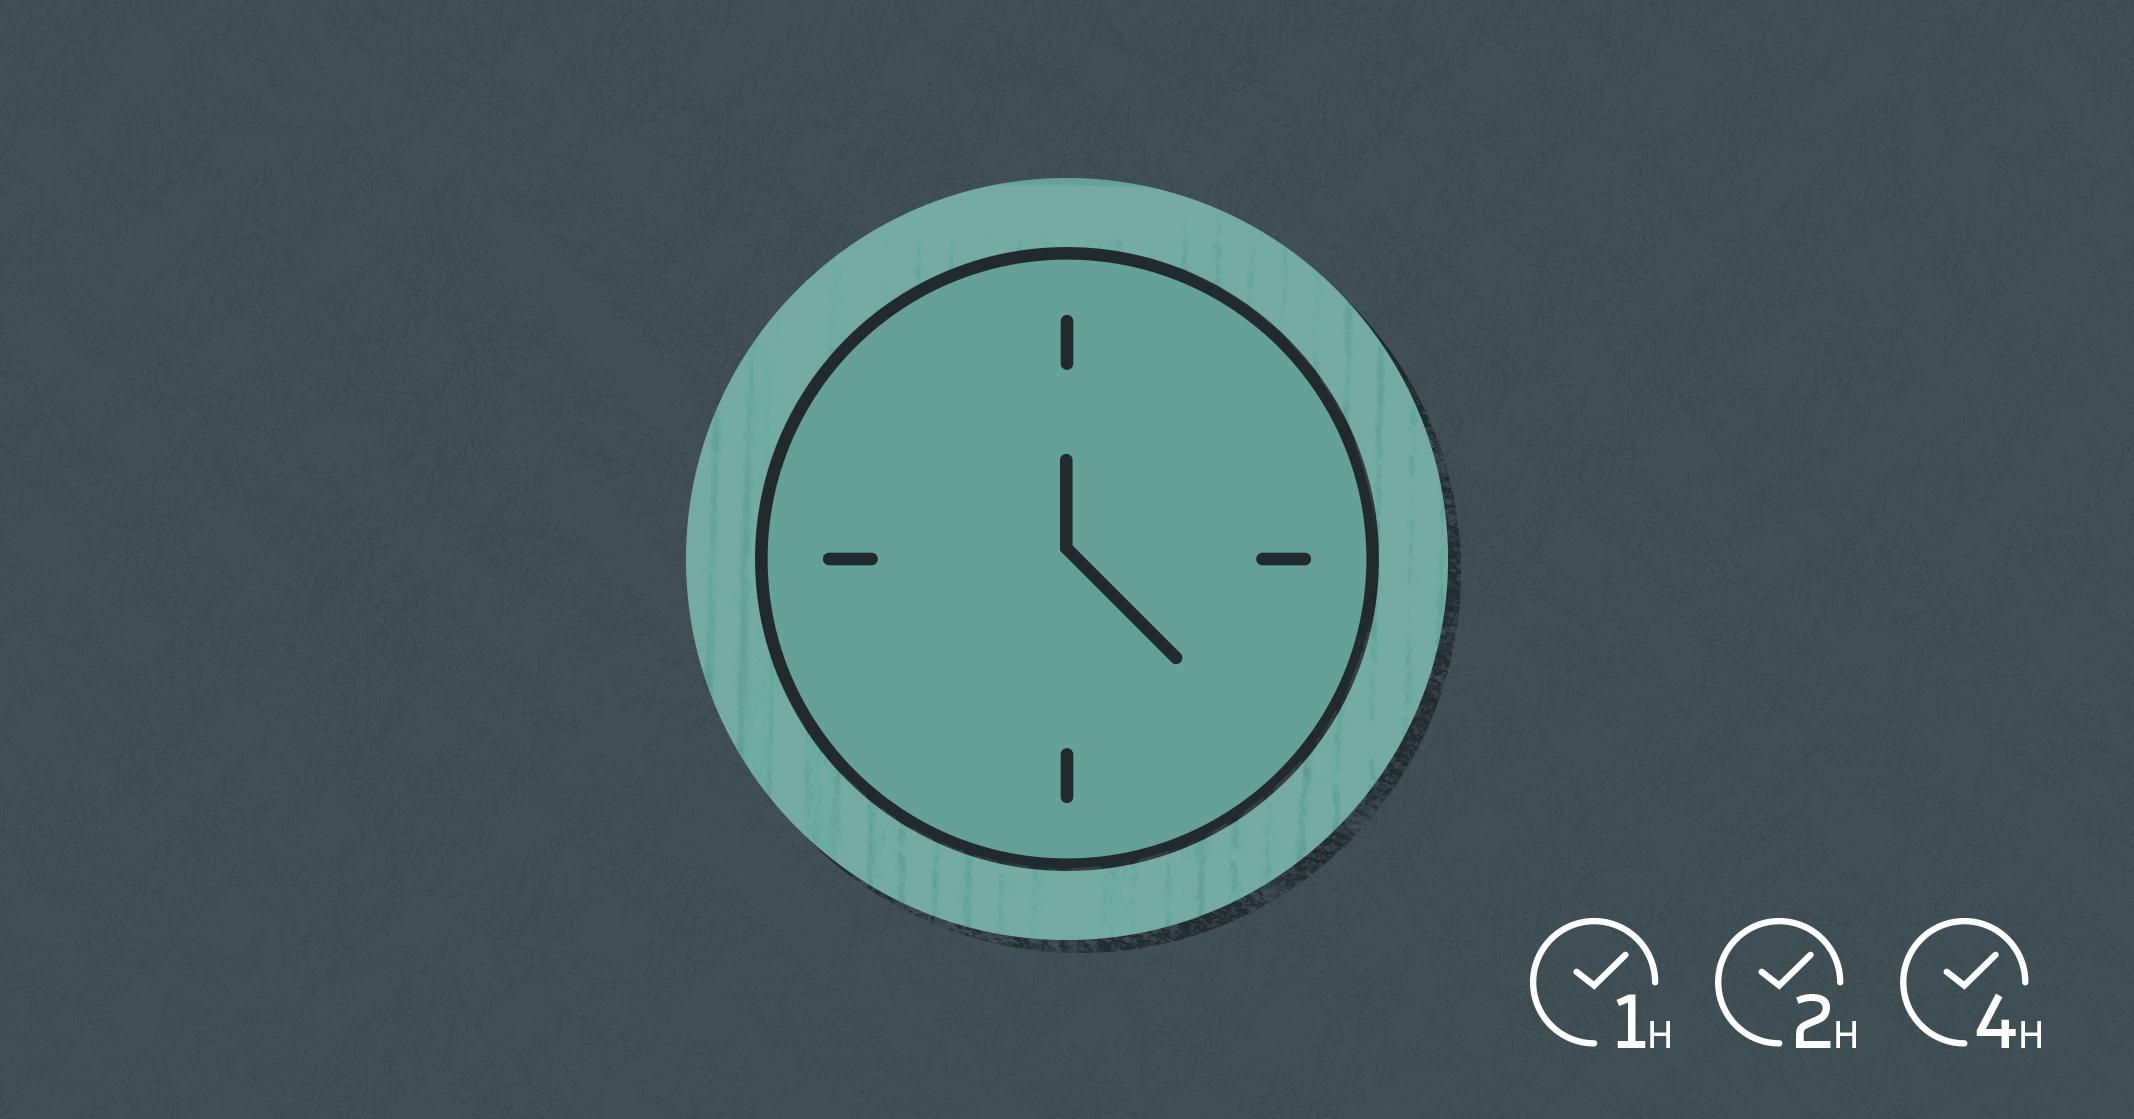 tempo_1_2_4.jpg